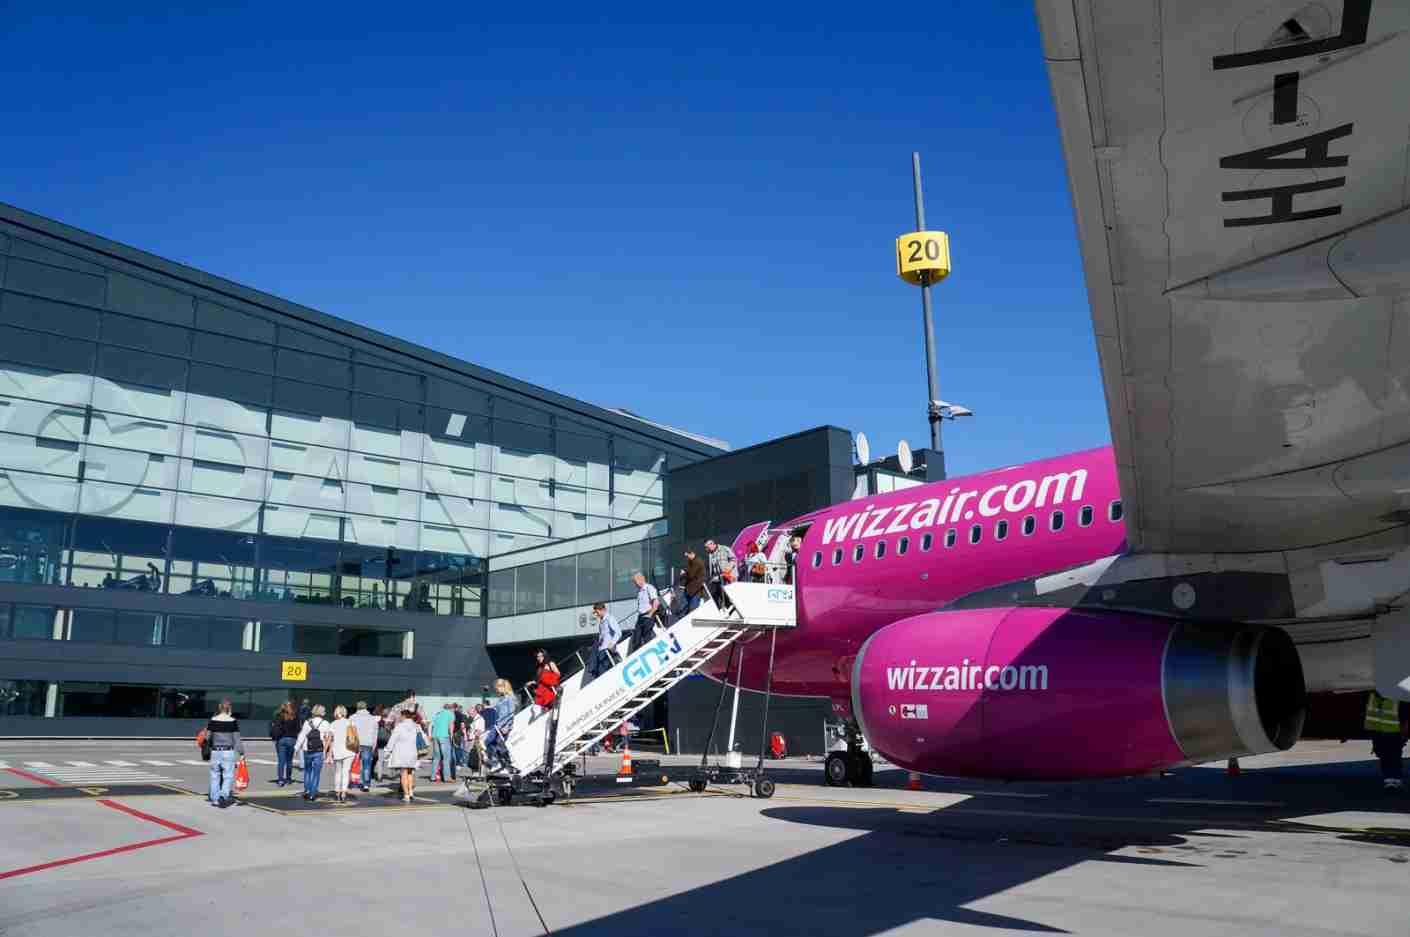 A Wizz Air Airbus A320. (Photo via Getty Images)